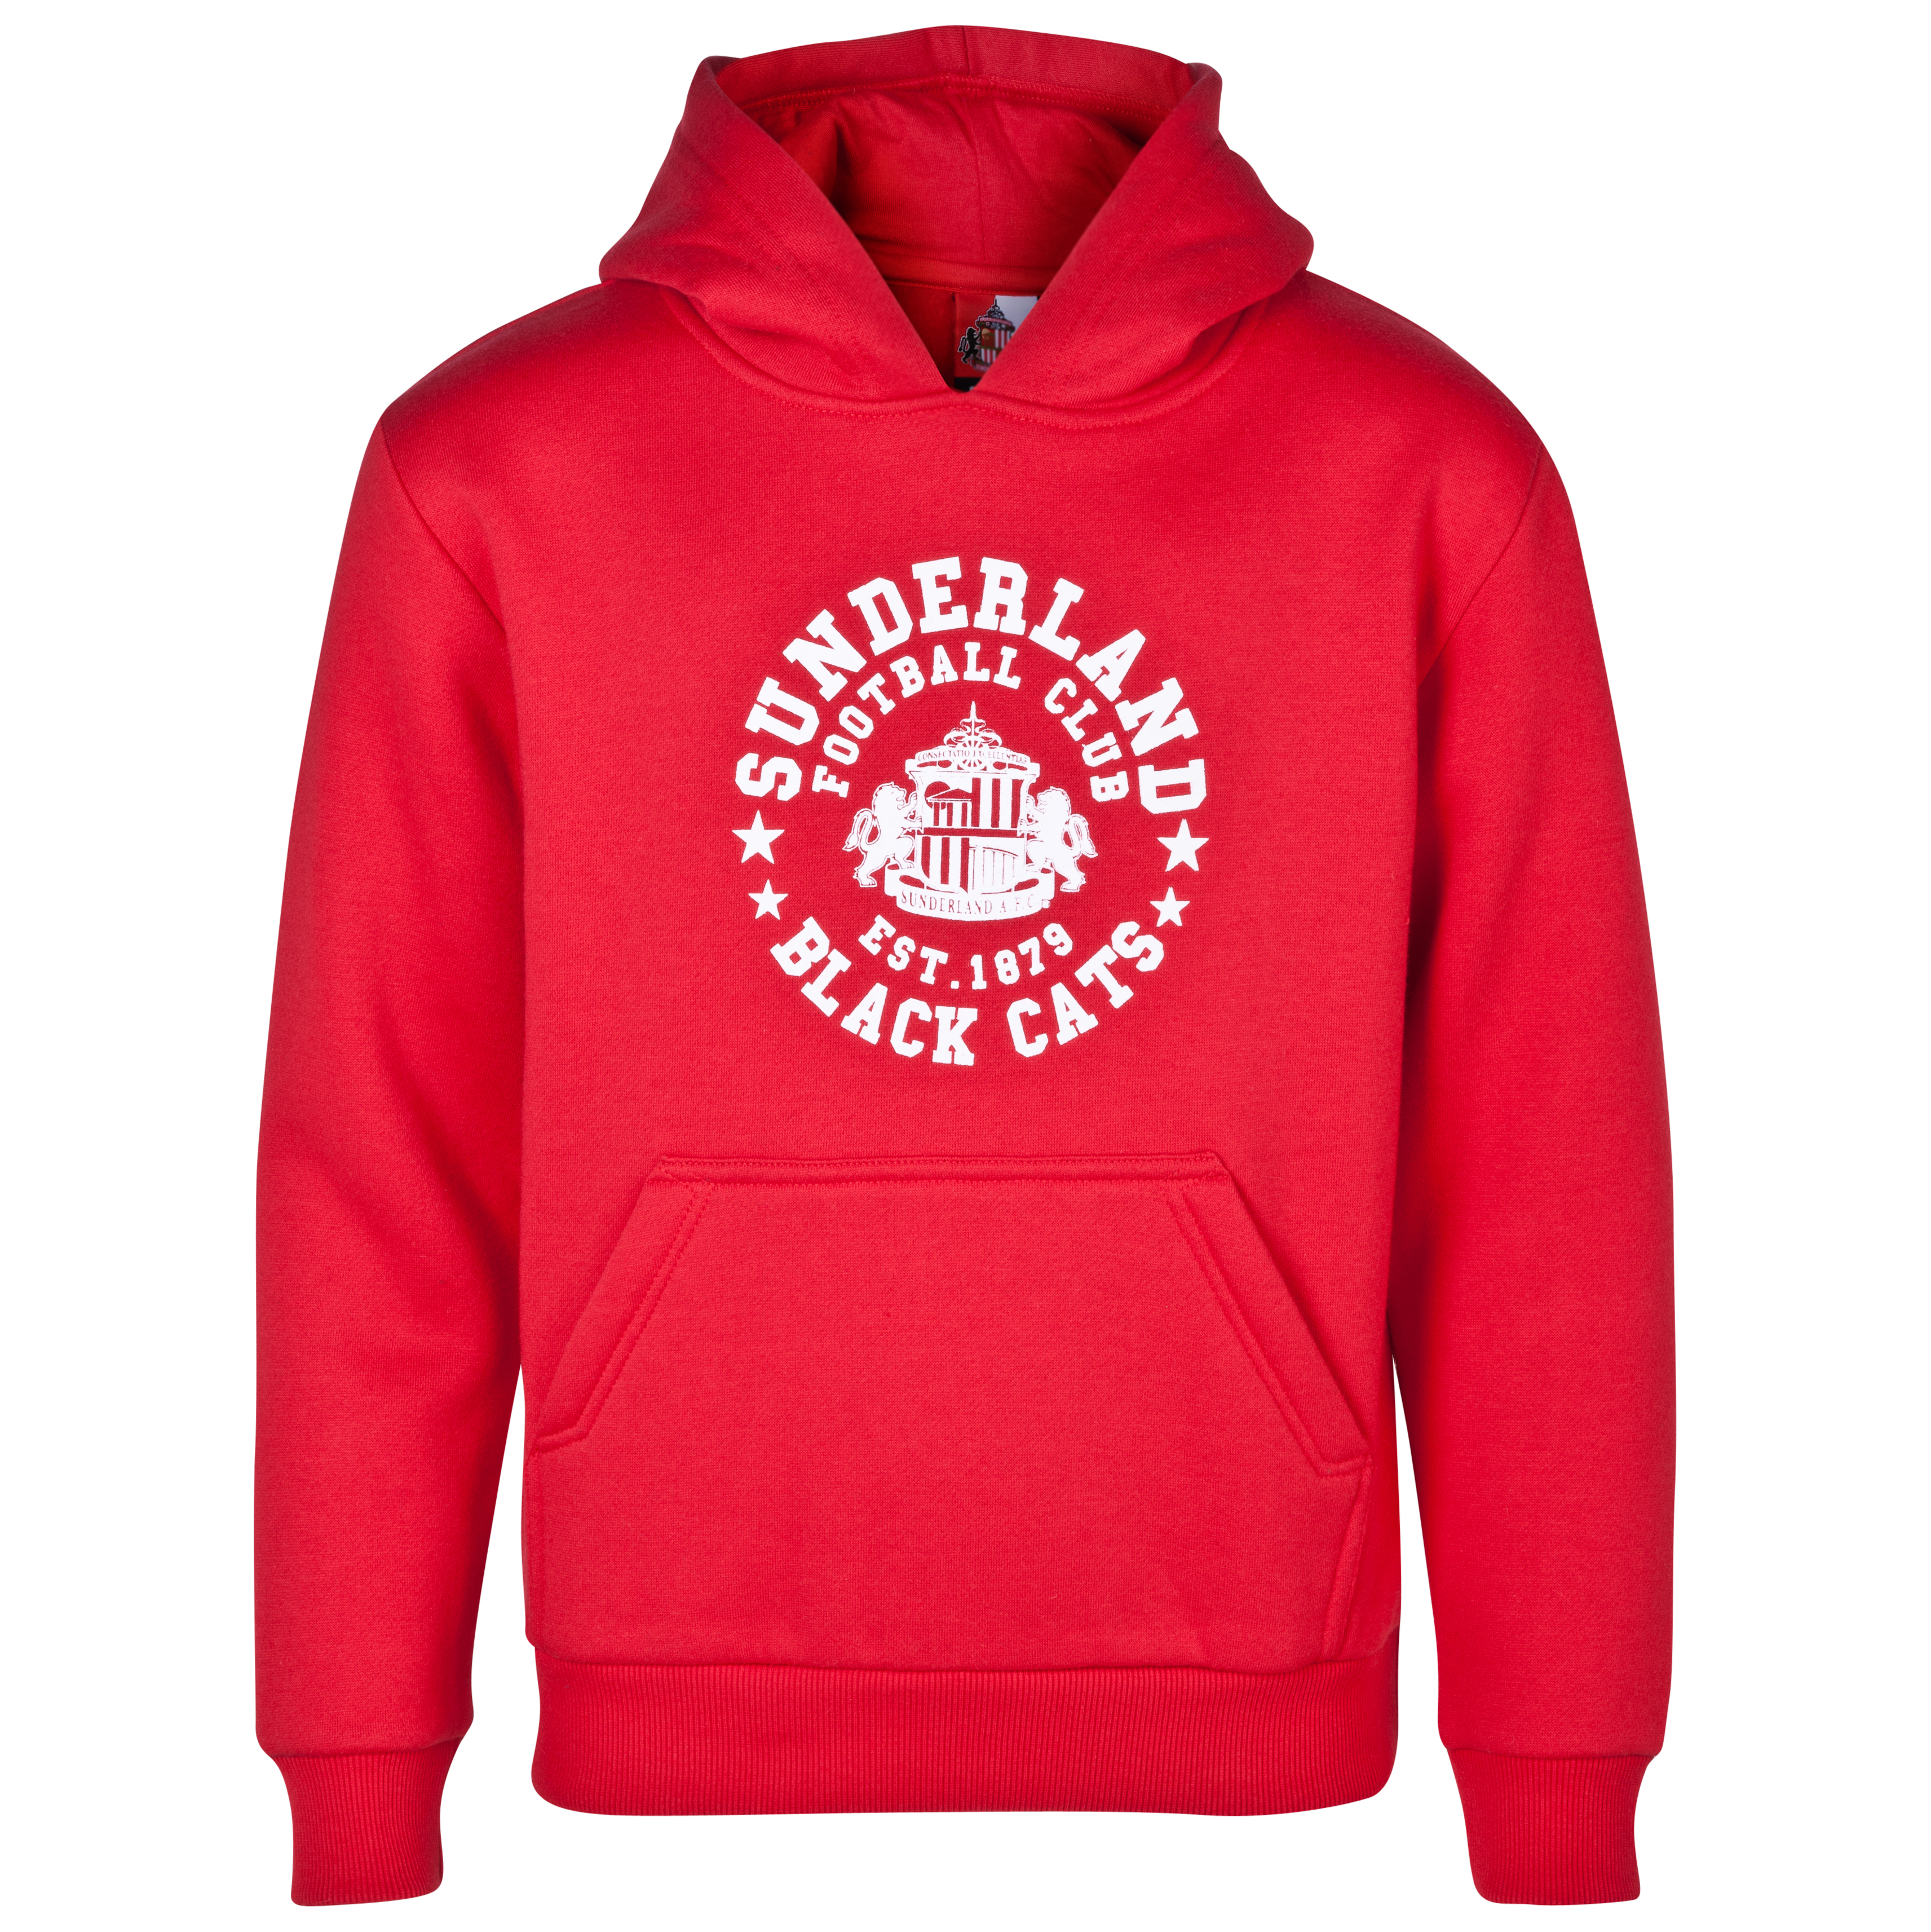 Sunderland Essentials Radius Hoody - Older Boys Red